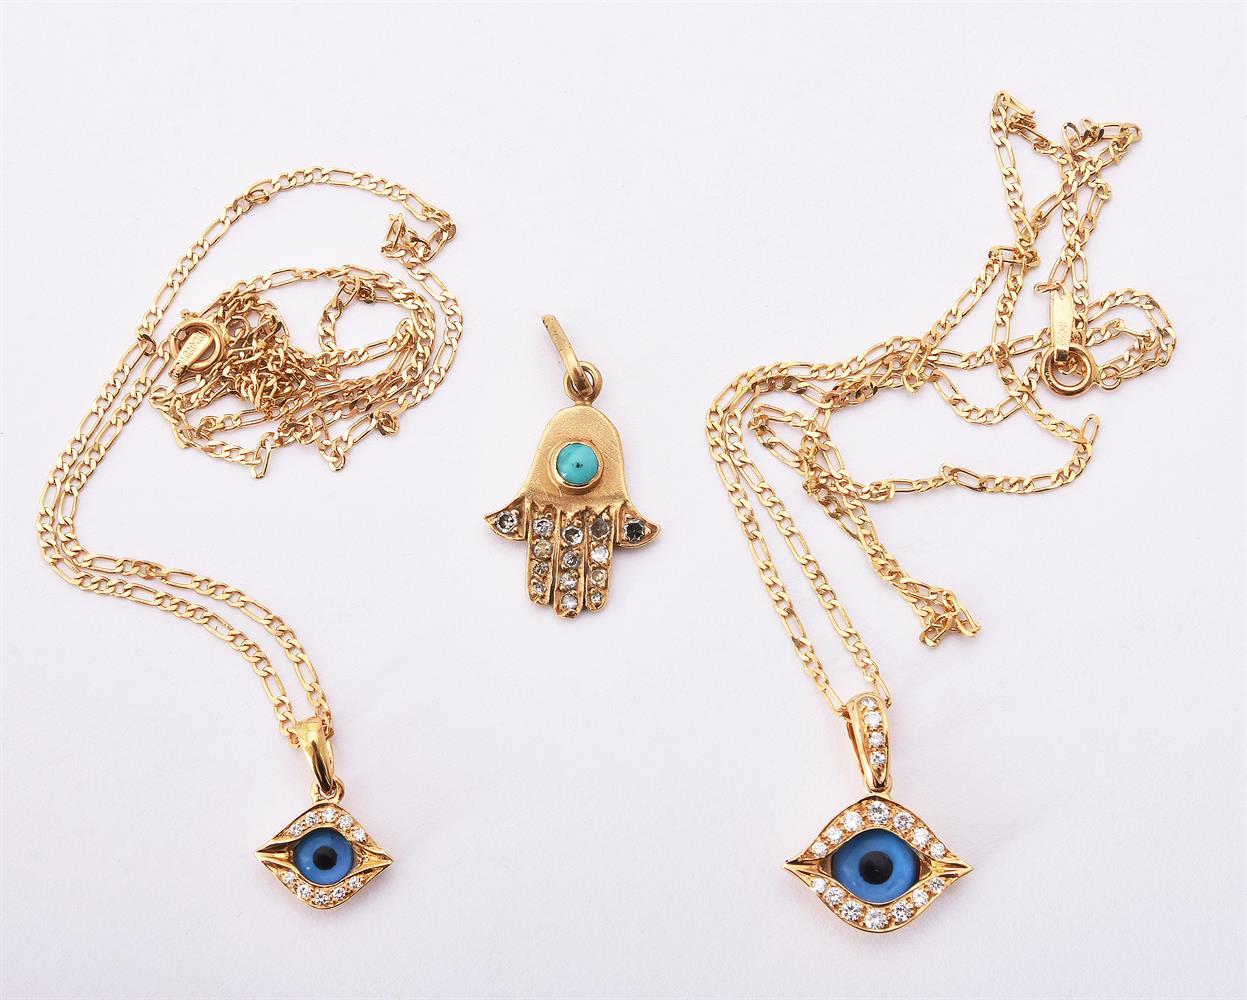 Two eye amulet pendants by Mouawad - Image 2 of 2